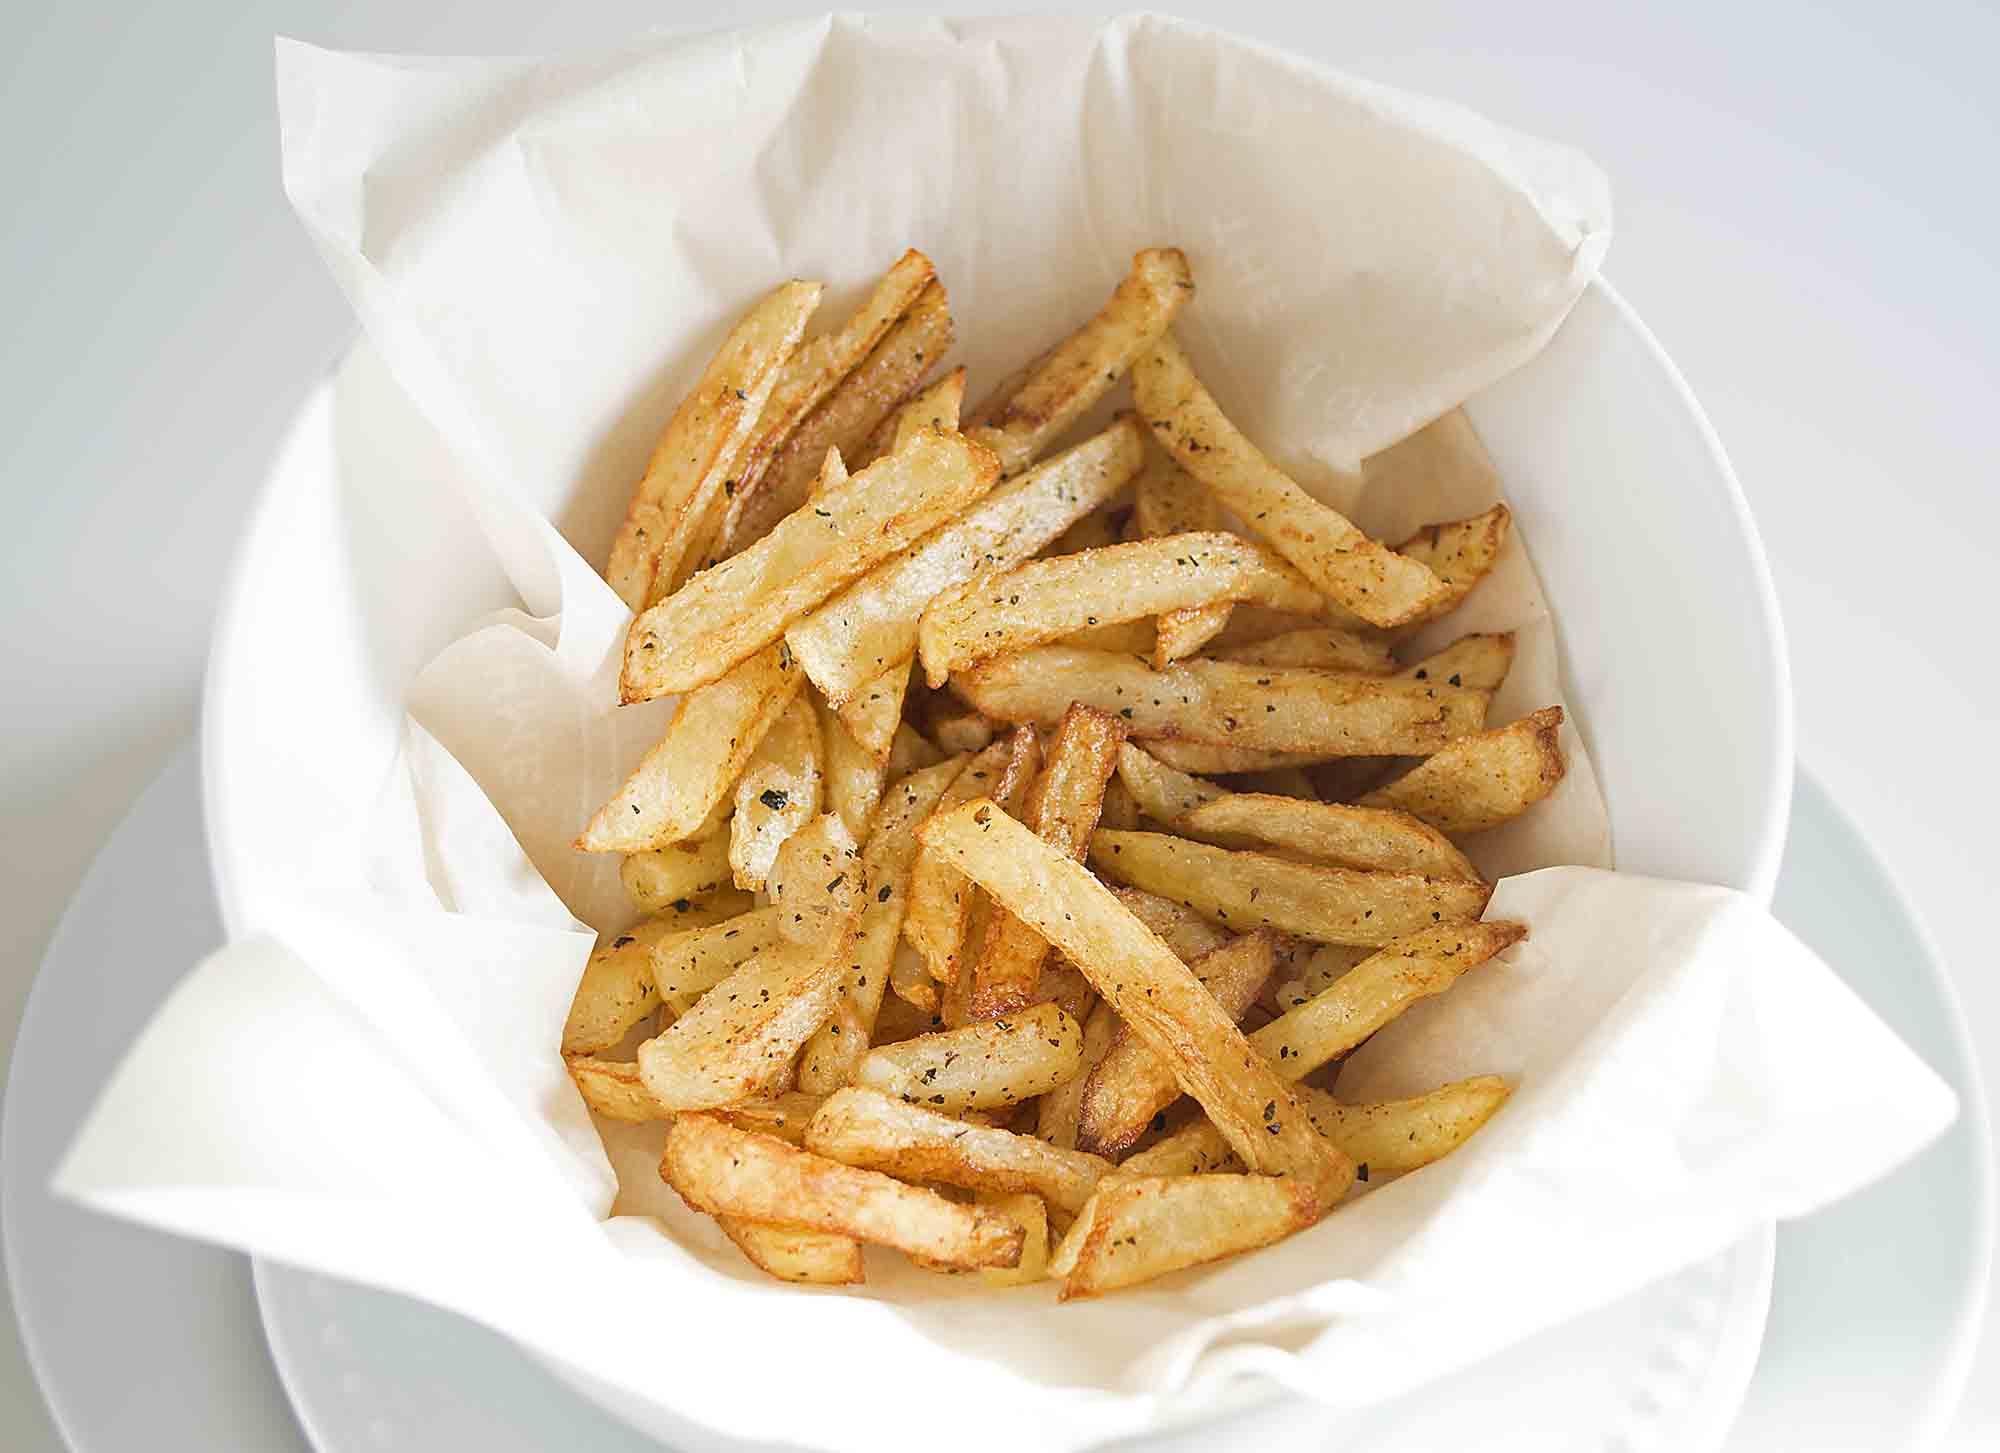 Homemade French Fry Seasoning